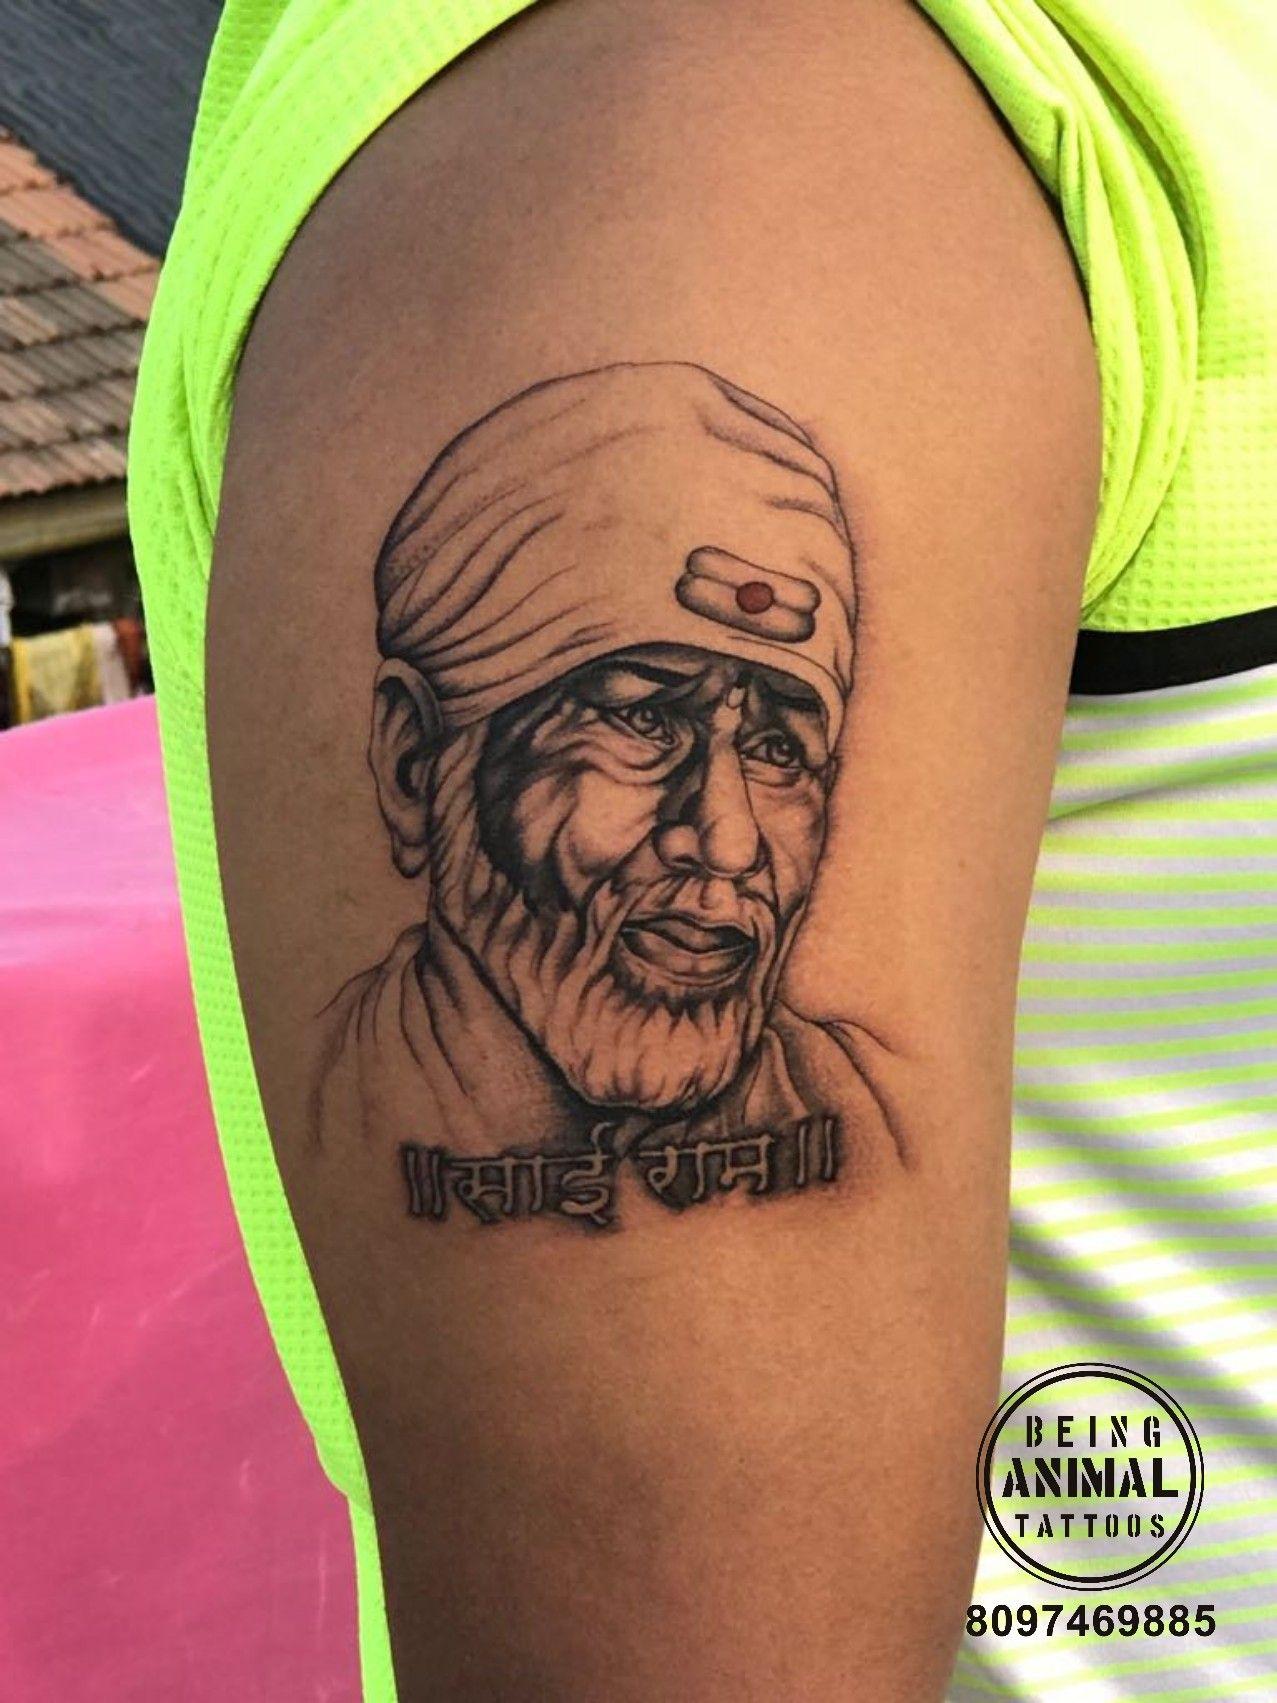 Sai baba tattoo by tattoo artist Sachin at being animal